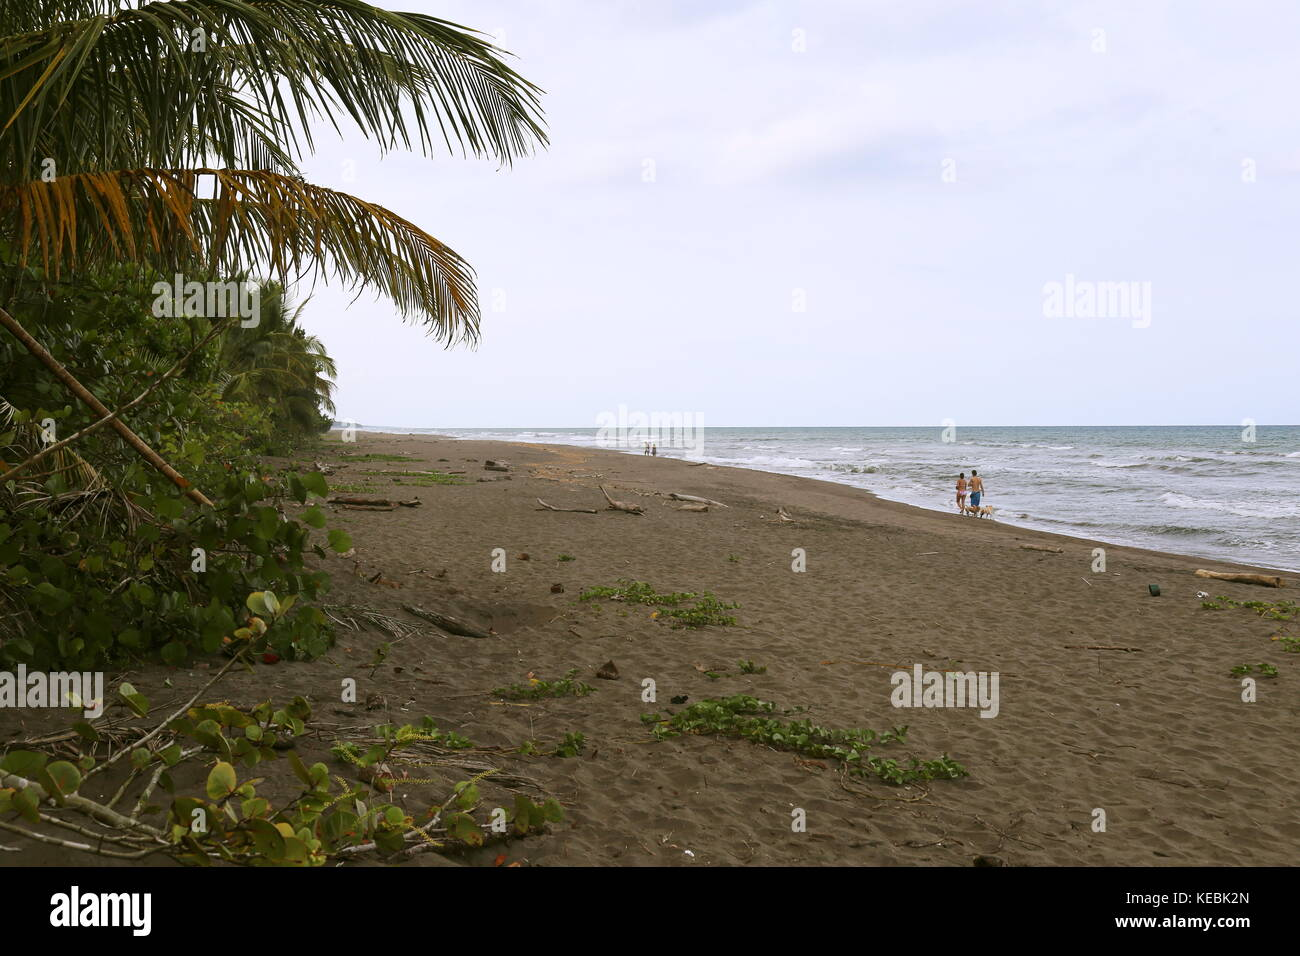 Tortuguero beach, Limón province, Caribbean Sea, Costa Rica, Central America - Stock Image